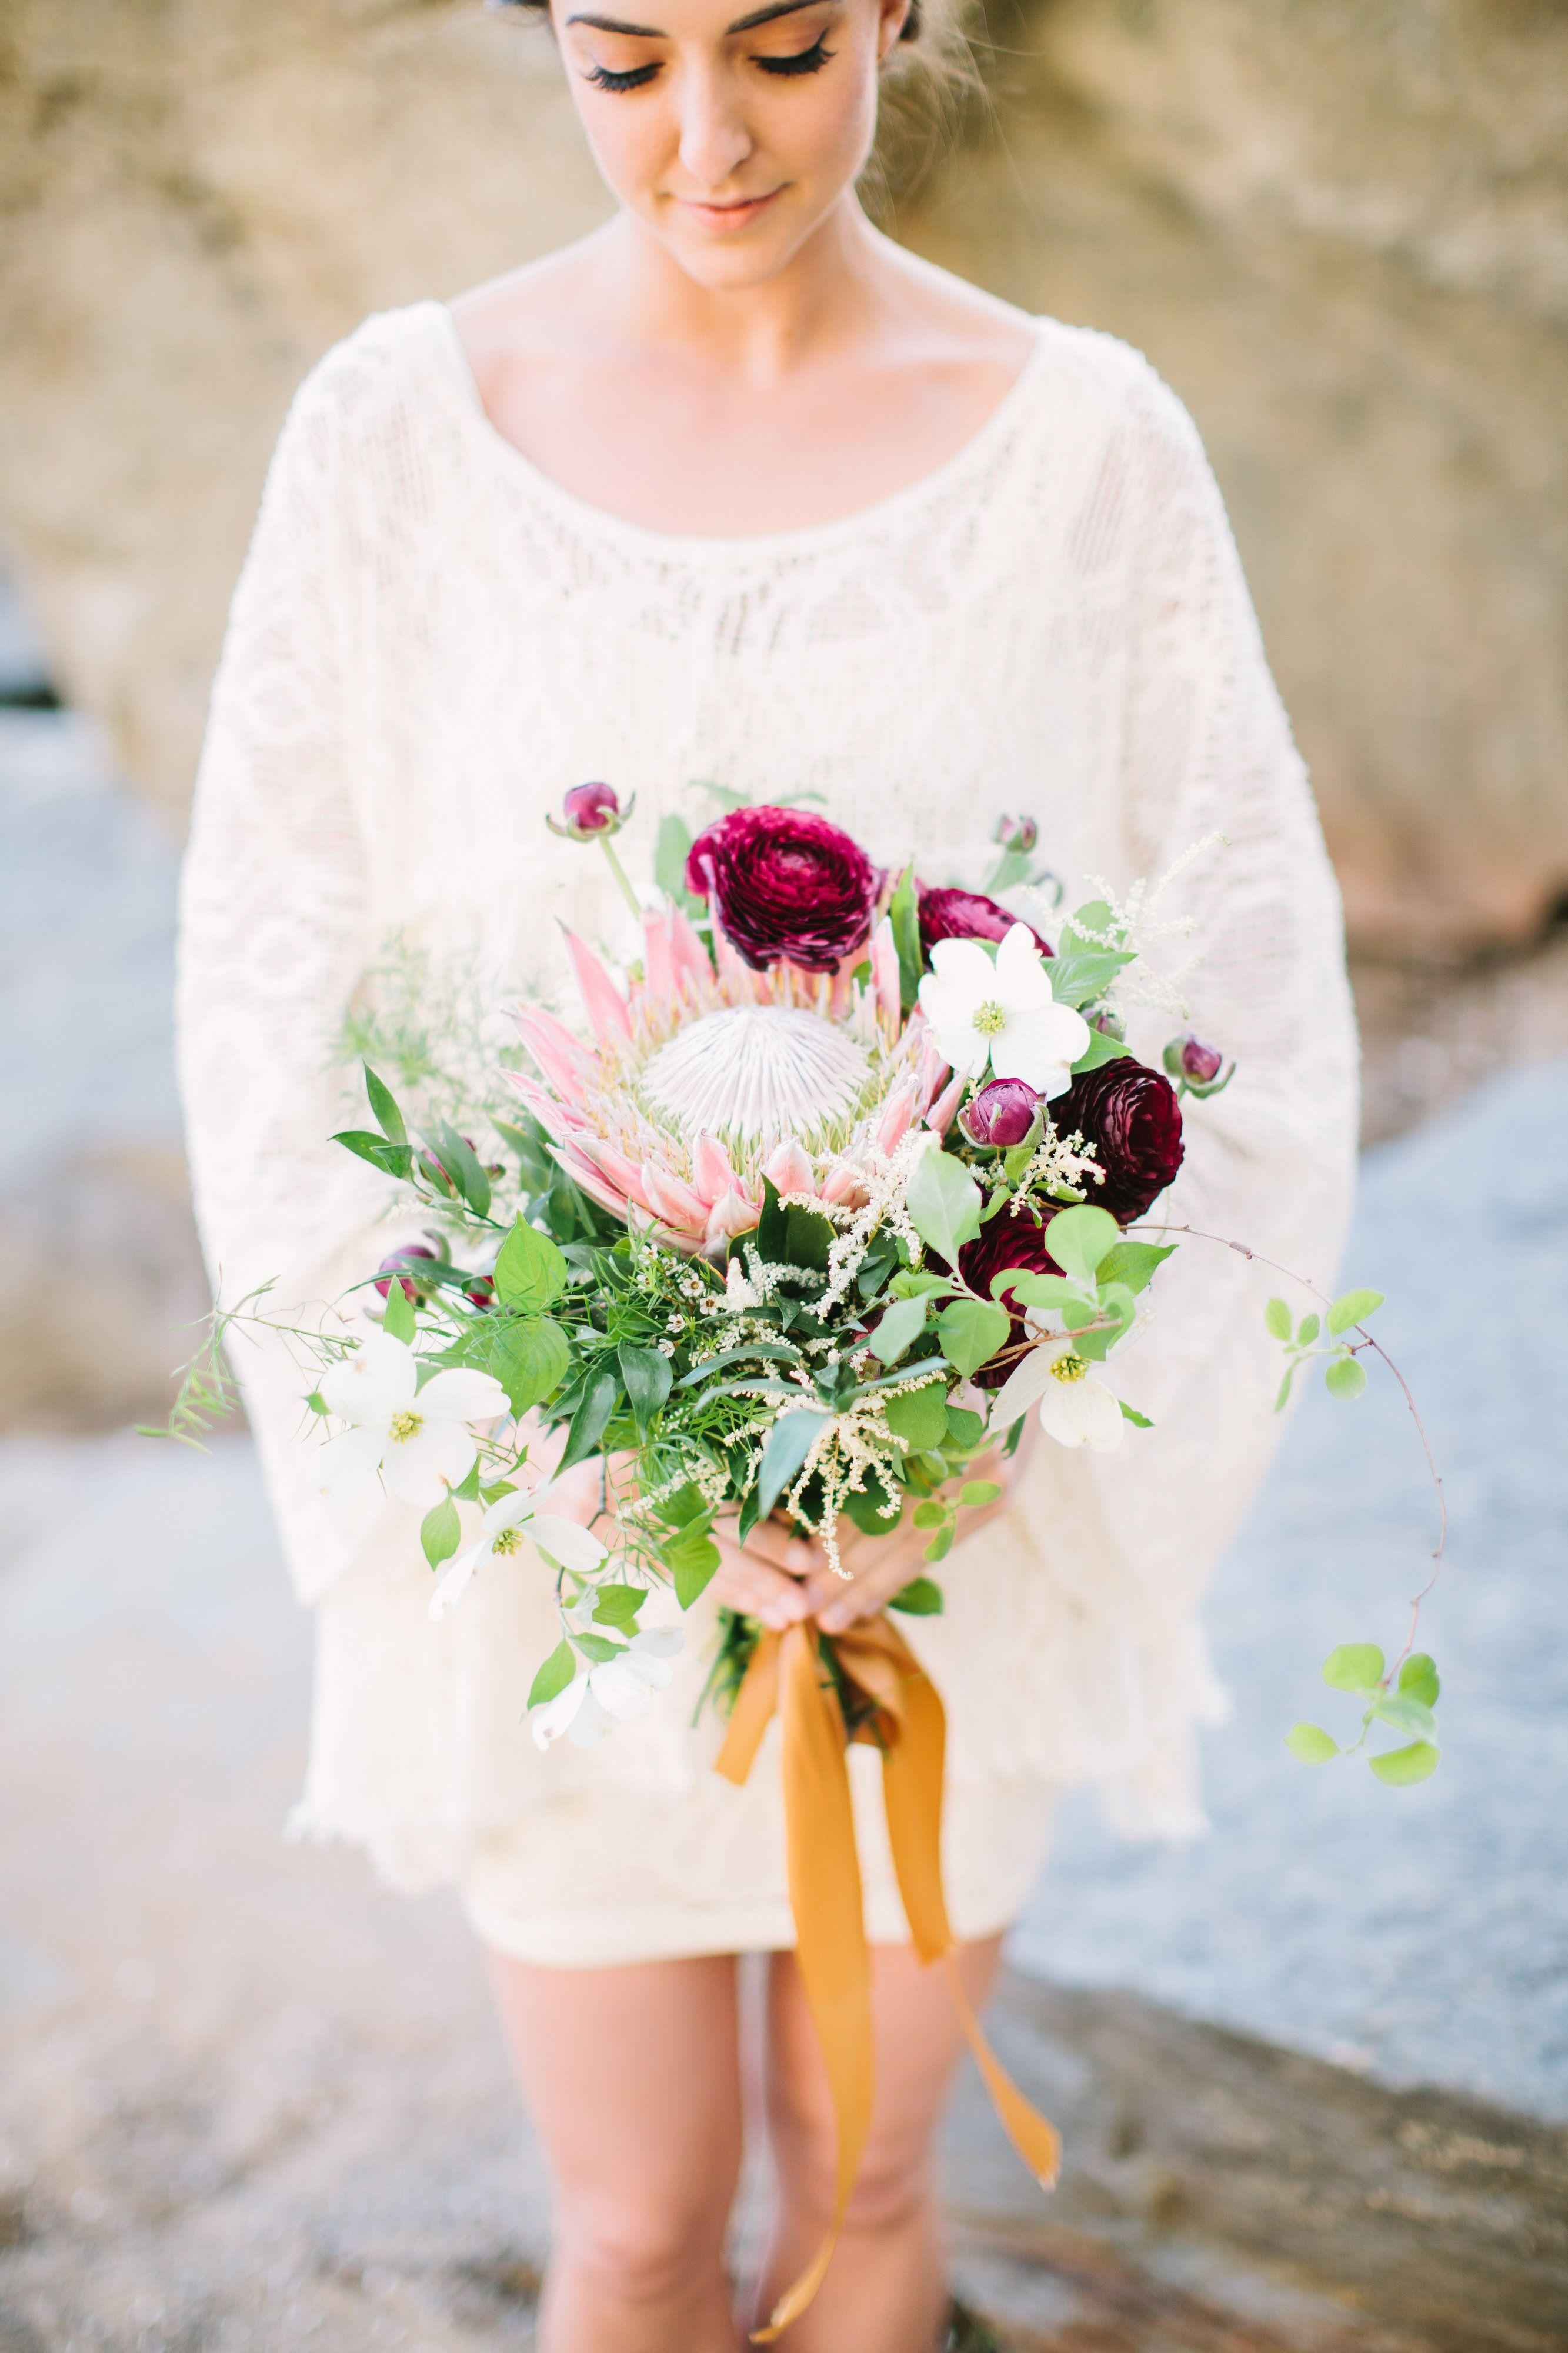 Bohemian floral wedding inspiration wedding flowers u boutonnières